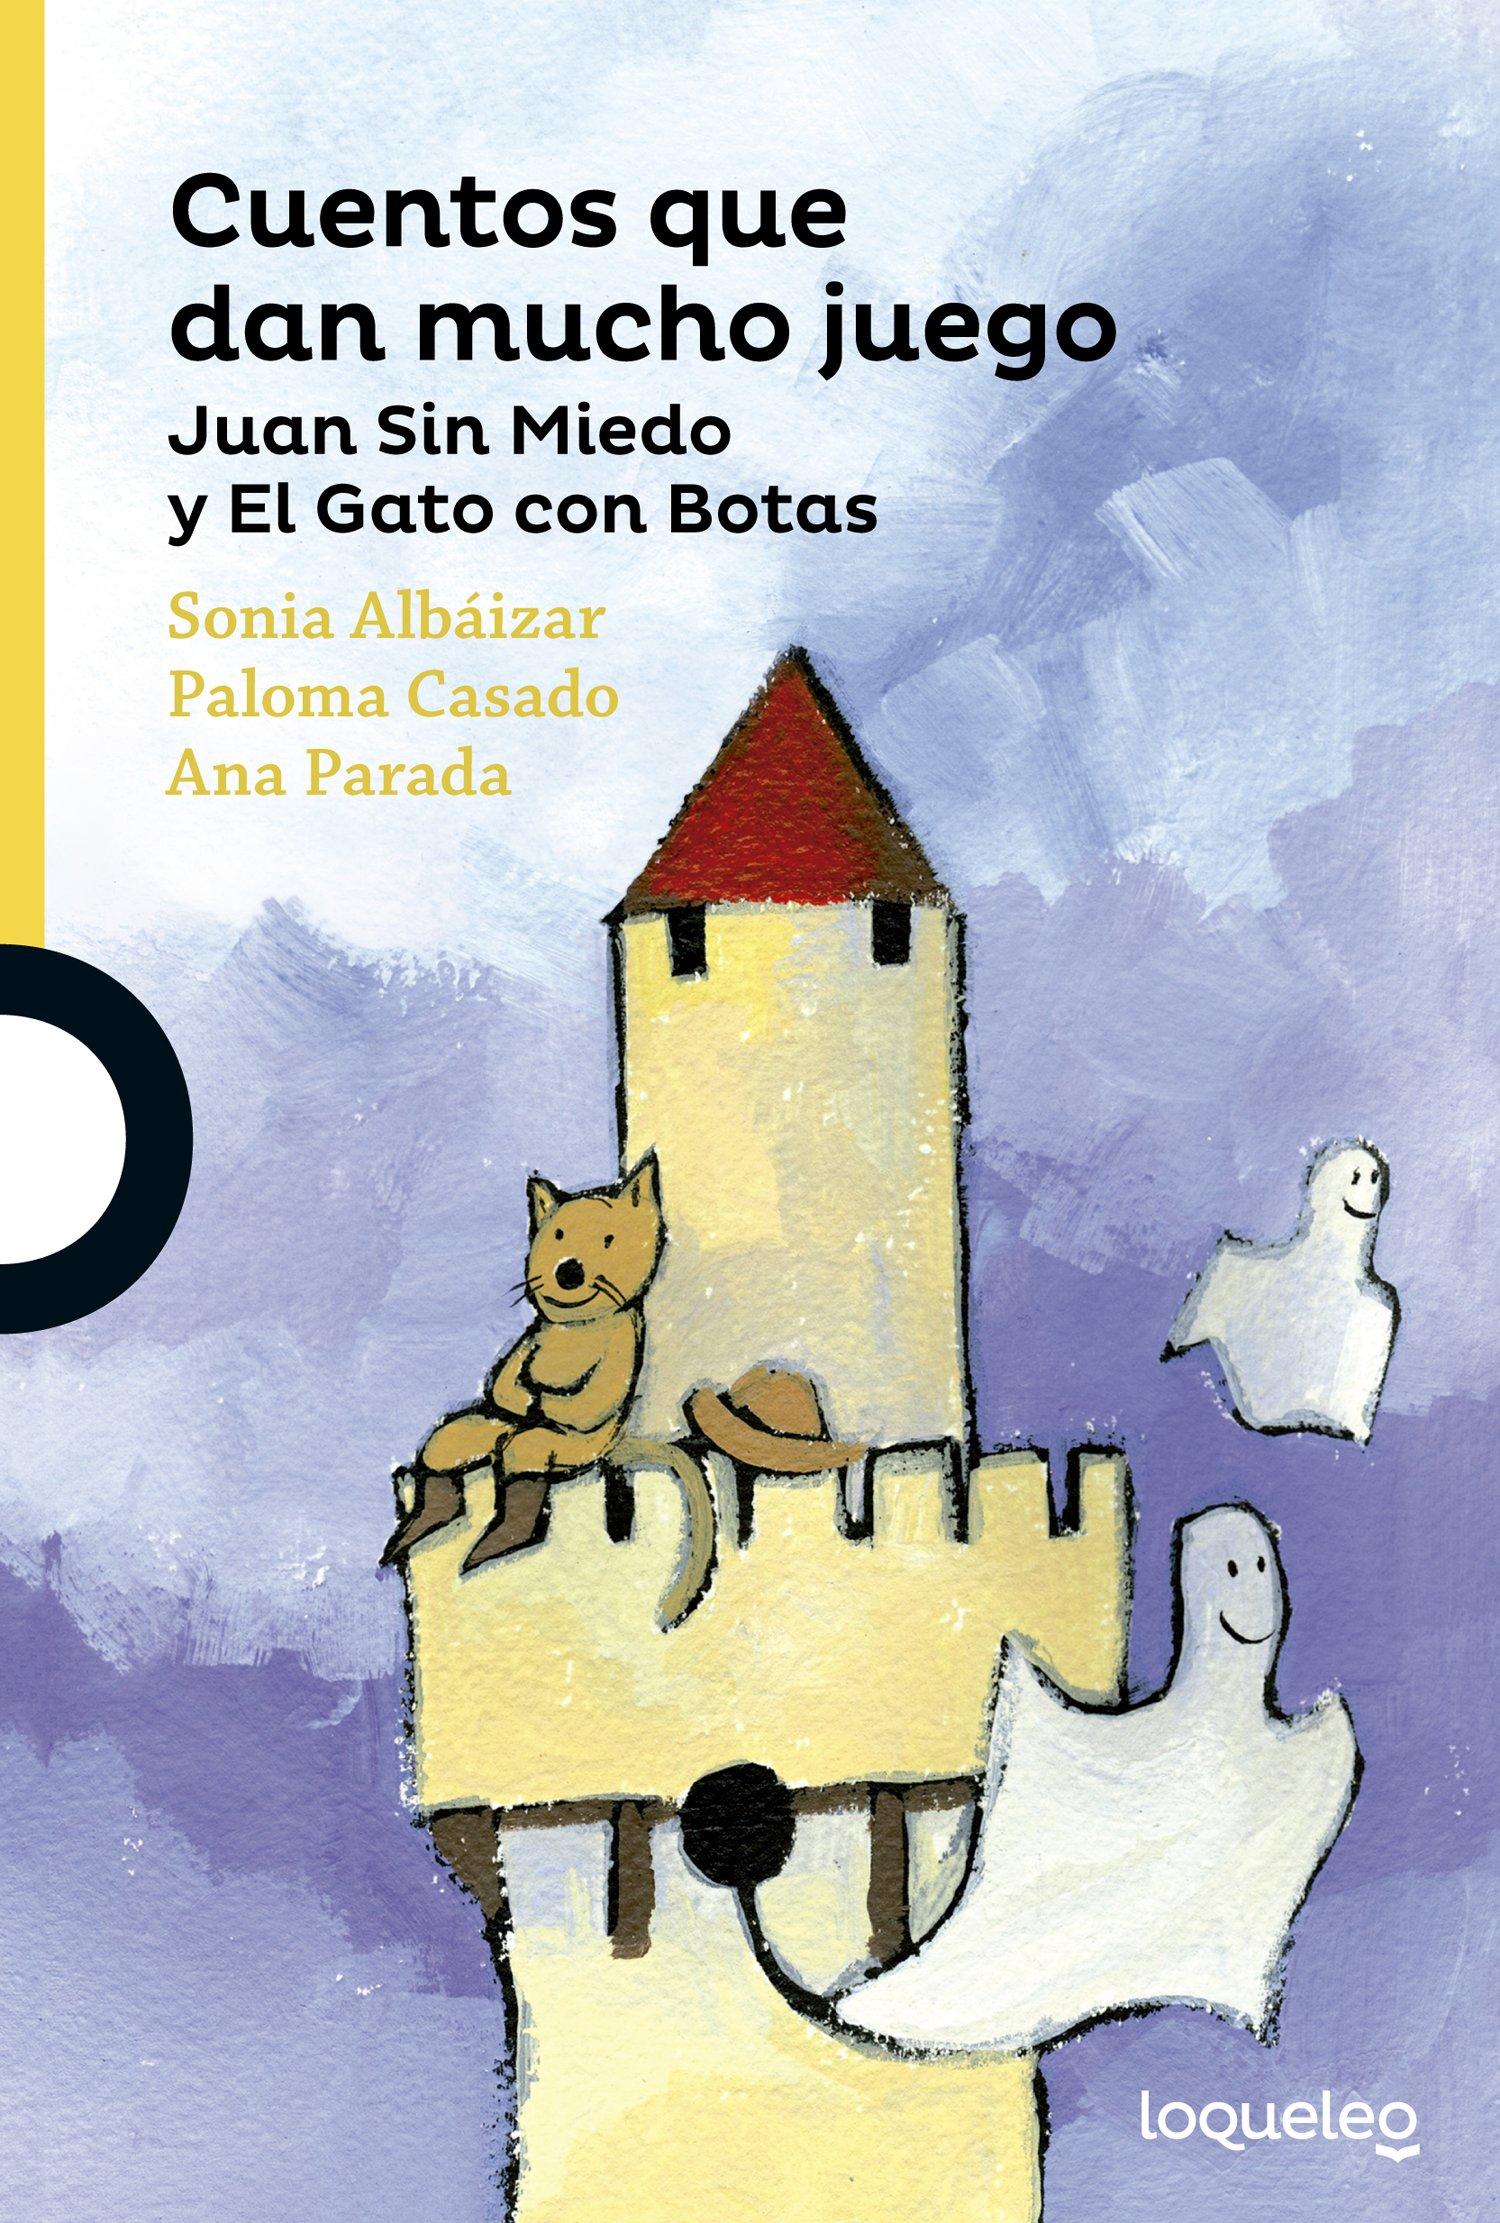 Cuentos que dan mucho juego (Spanish) Paperback – January 1, 2016